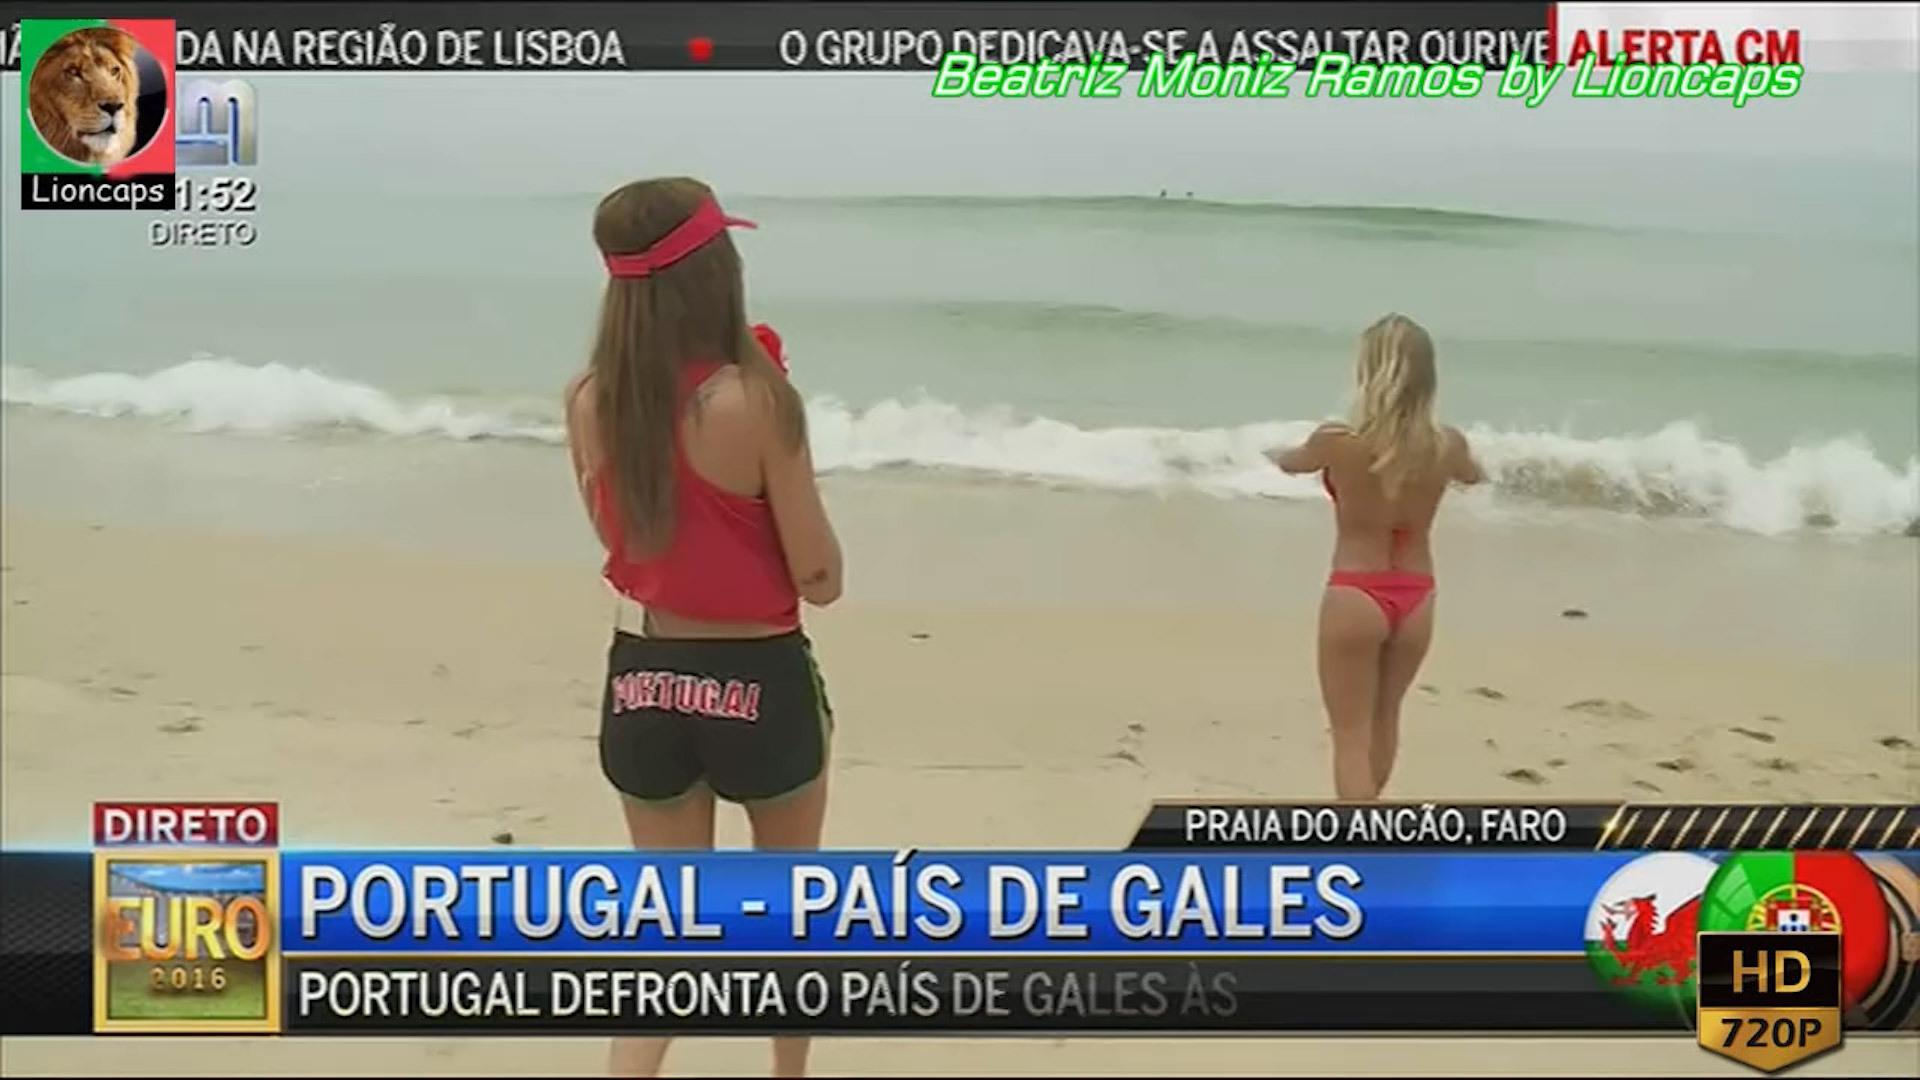 best_off_portugal_b_lioncaps_13_12_2020_03 (7).jpg